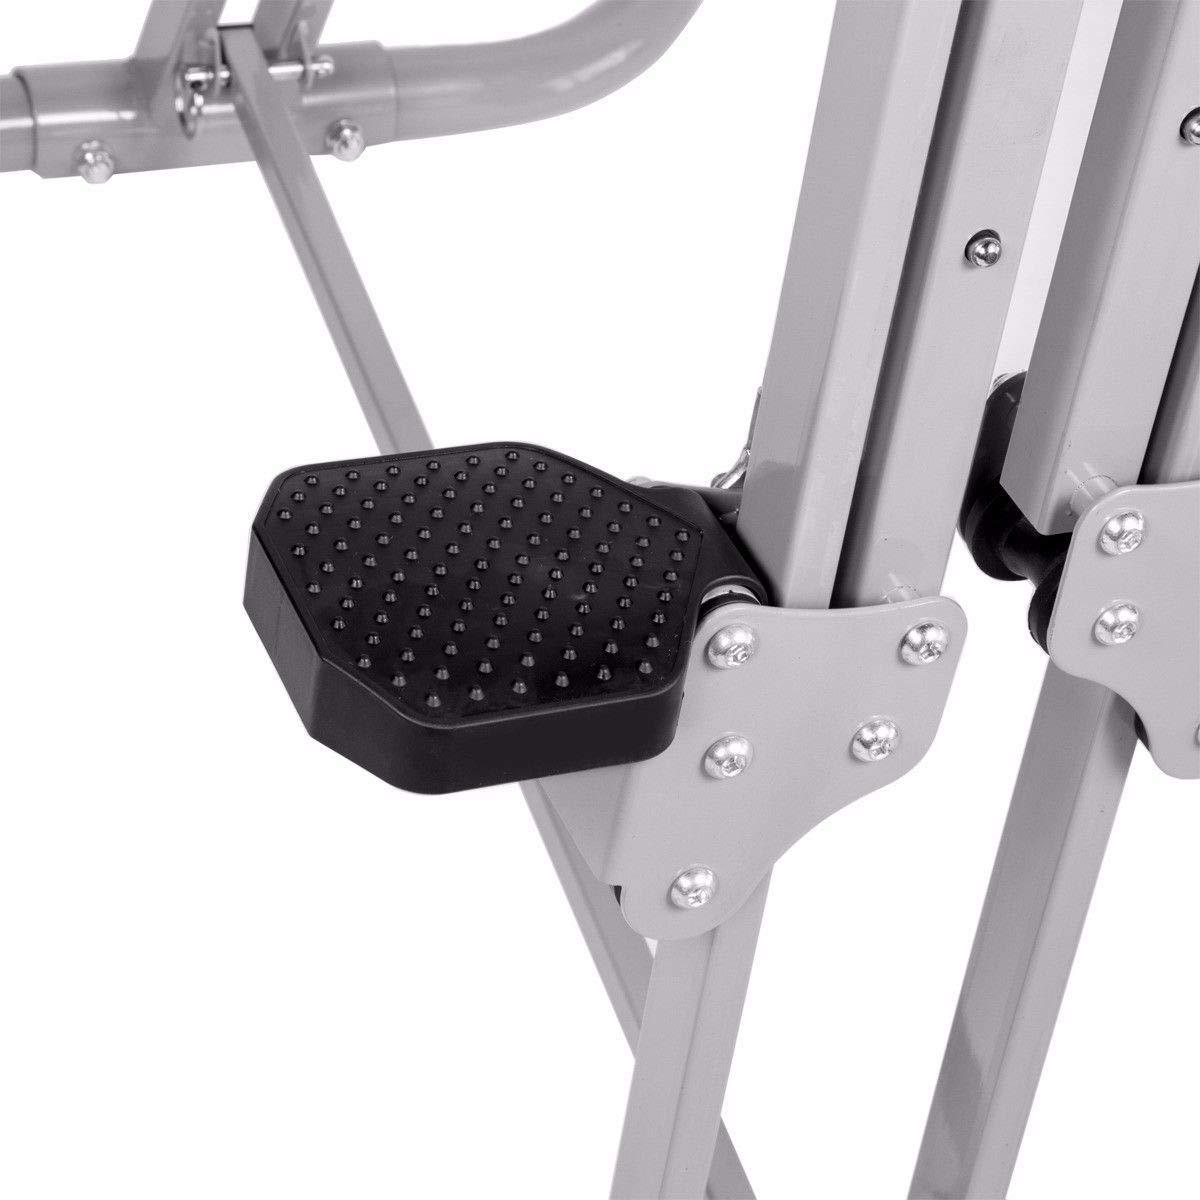 XtremepowerUS Vertical Climber Fitness Cardio Exercise Machine by XtremepowerUS (Image #9)